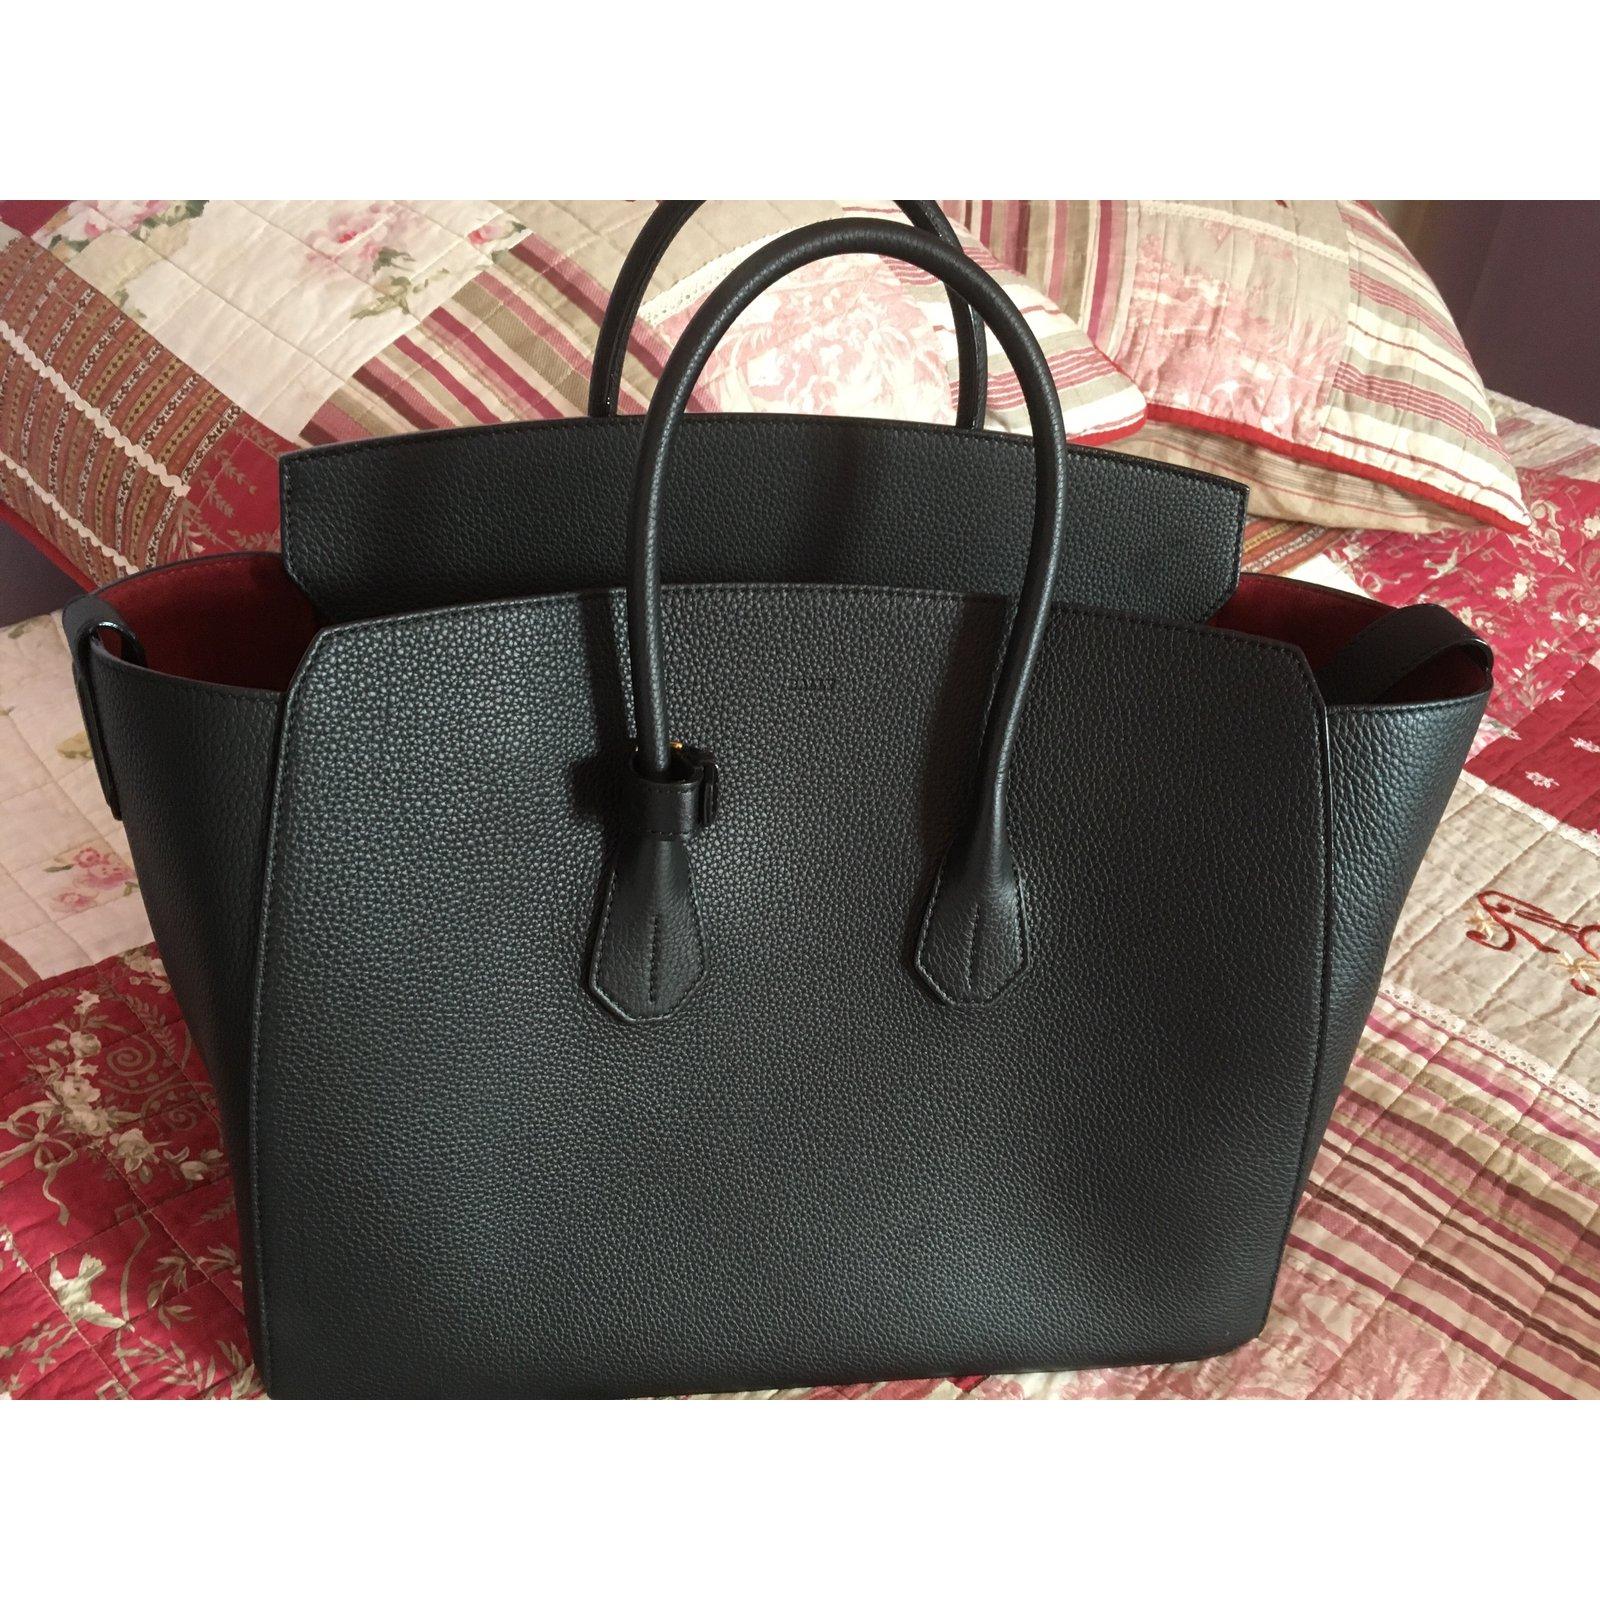 7cb60c3f7b Bally Big Bally Black Top Handbag Handbags Leather Black ref.103649 - Joli  Closet